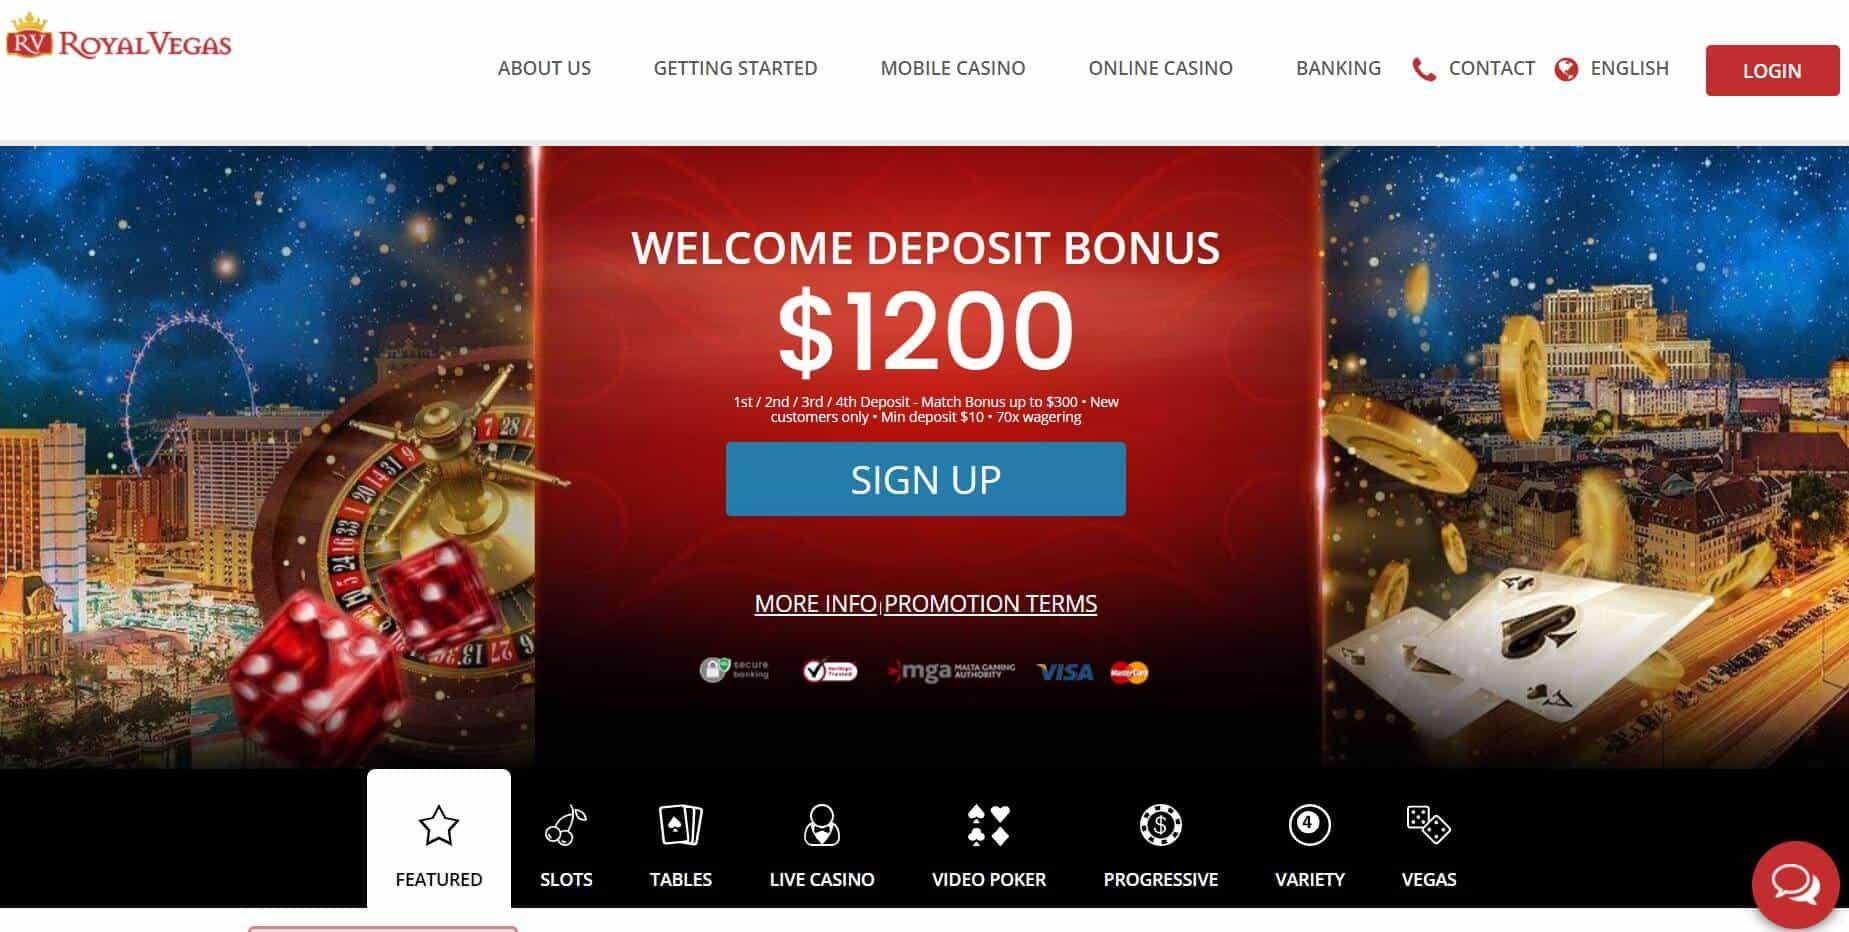 Royal Vegas homepage